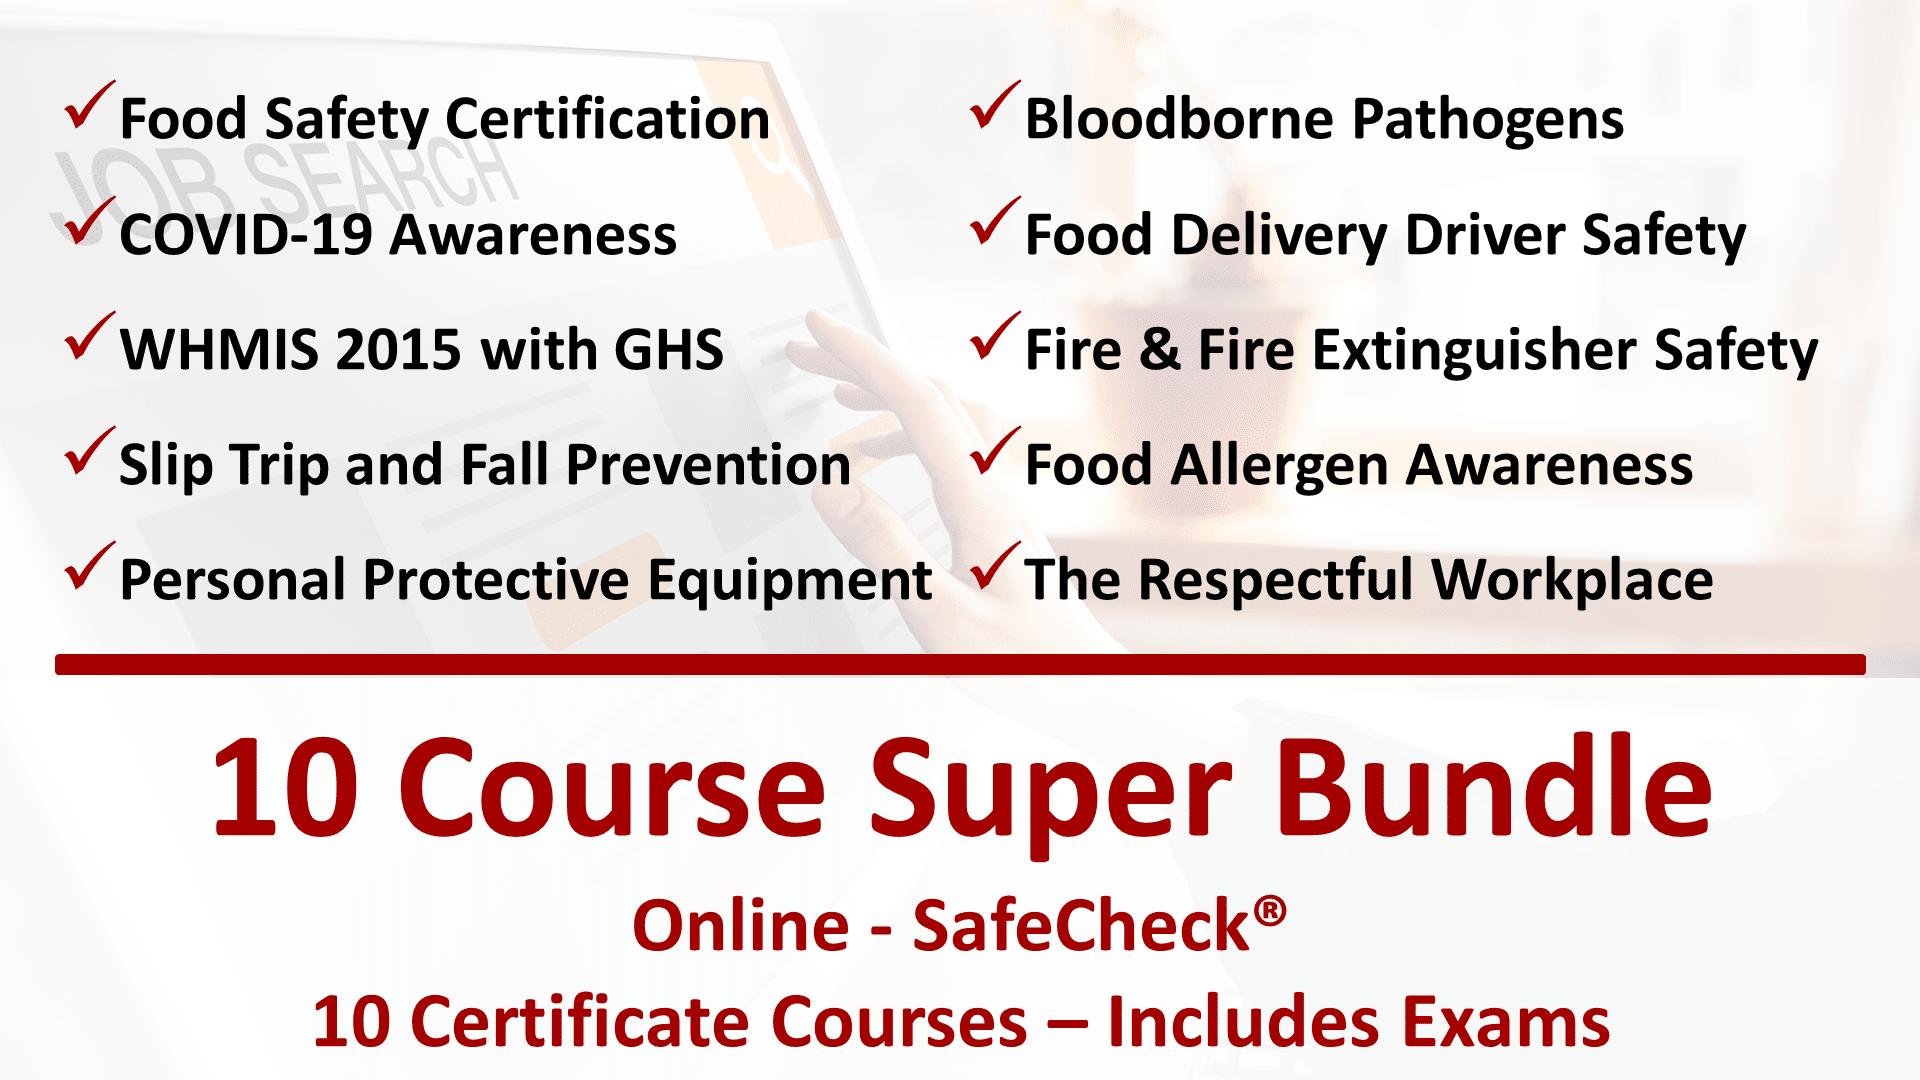 10 Course SafeCheck Super Bundle Offer